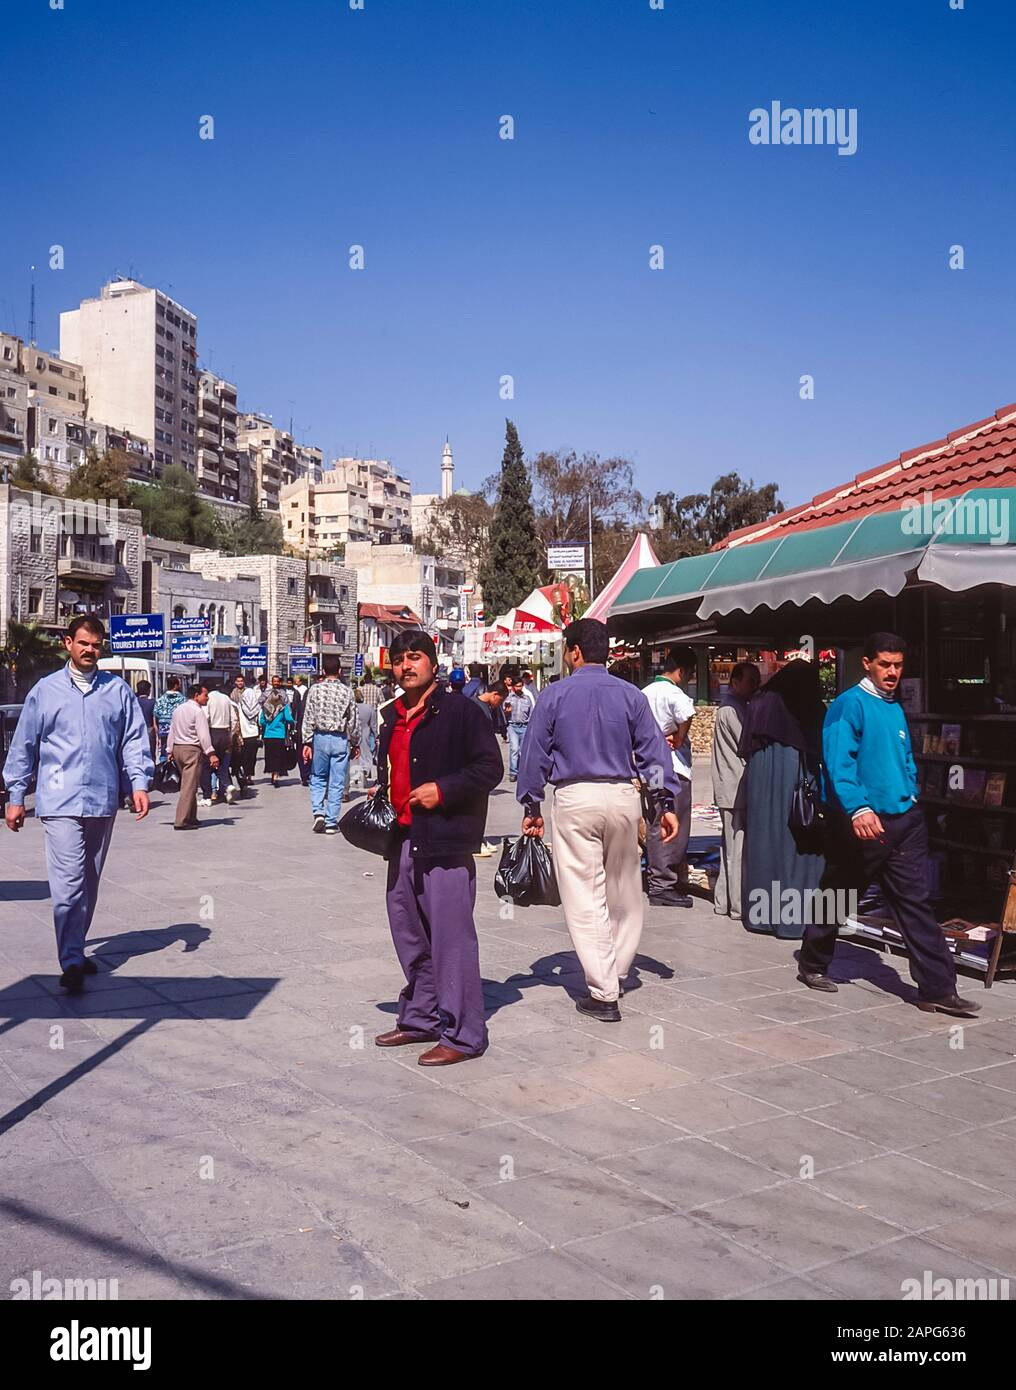 Jordan. Street scene in the market place in the Jordan capital city of Amman Stock Photo